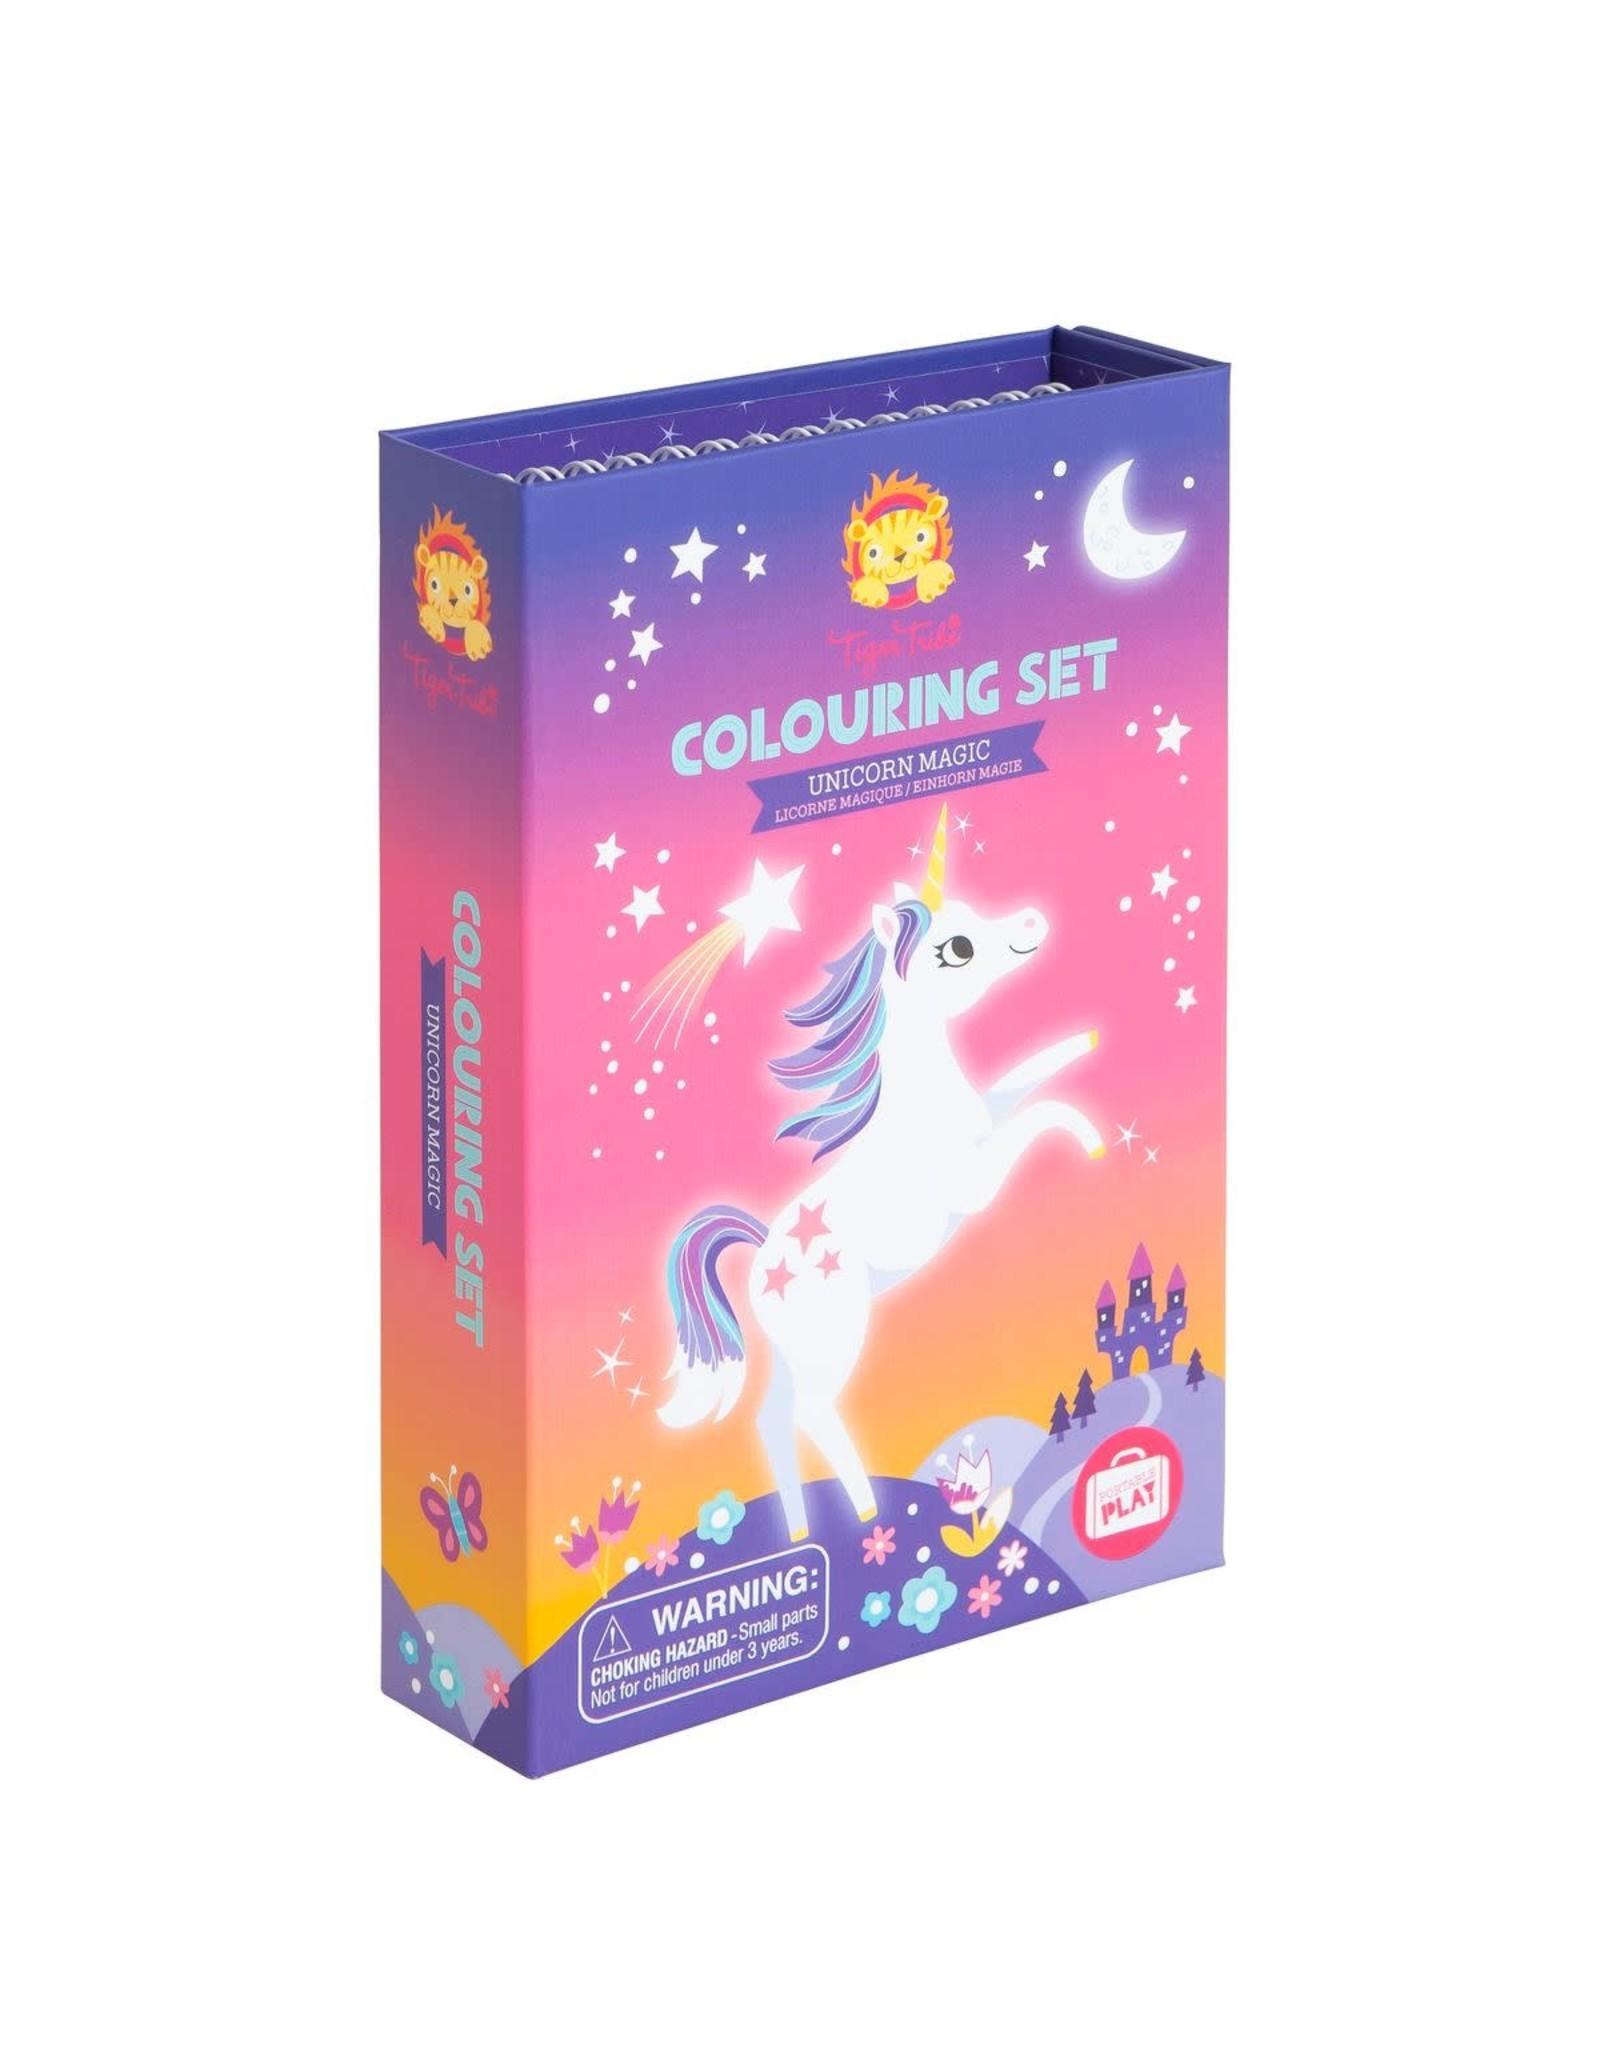 Tiger Tribe Colouring Set Unicorn Magic